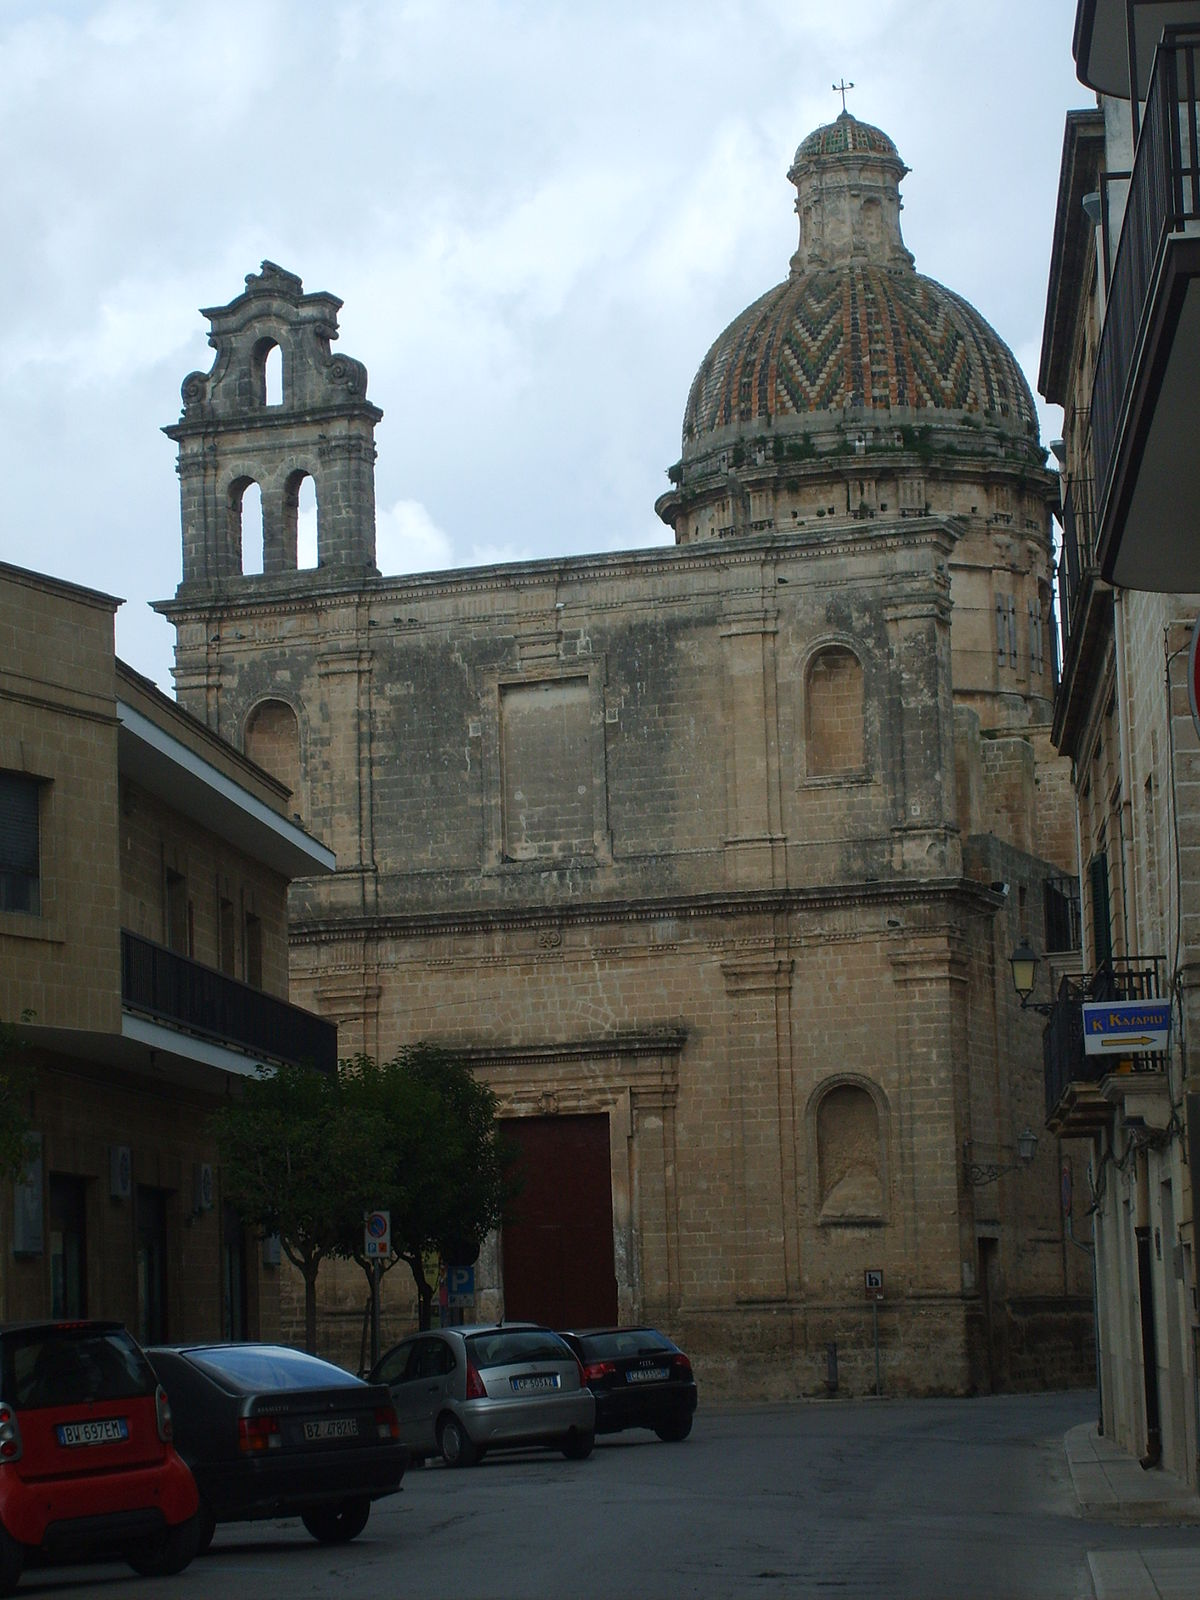 Chiesa di san sebastiano francavilla fontana wikipedia for Fiusco arredi francavilla fontana